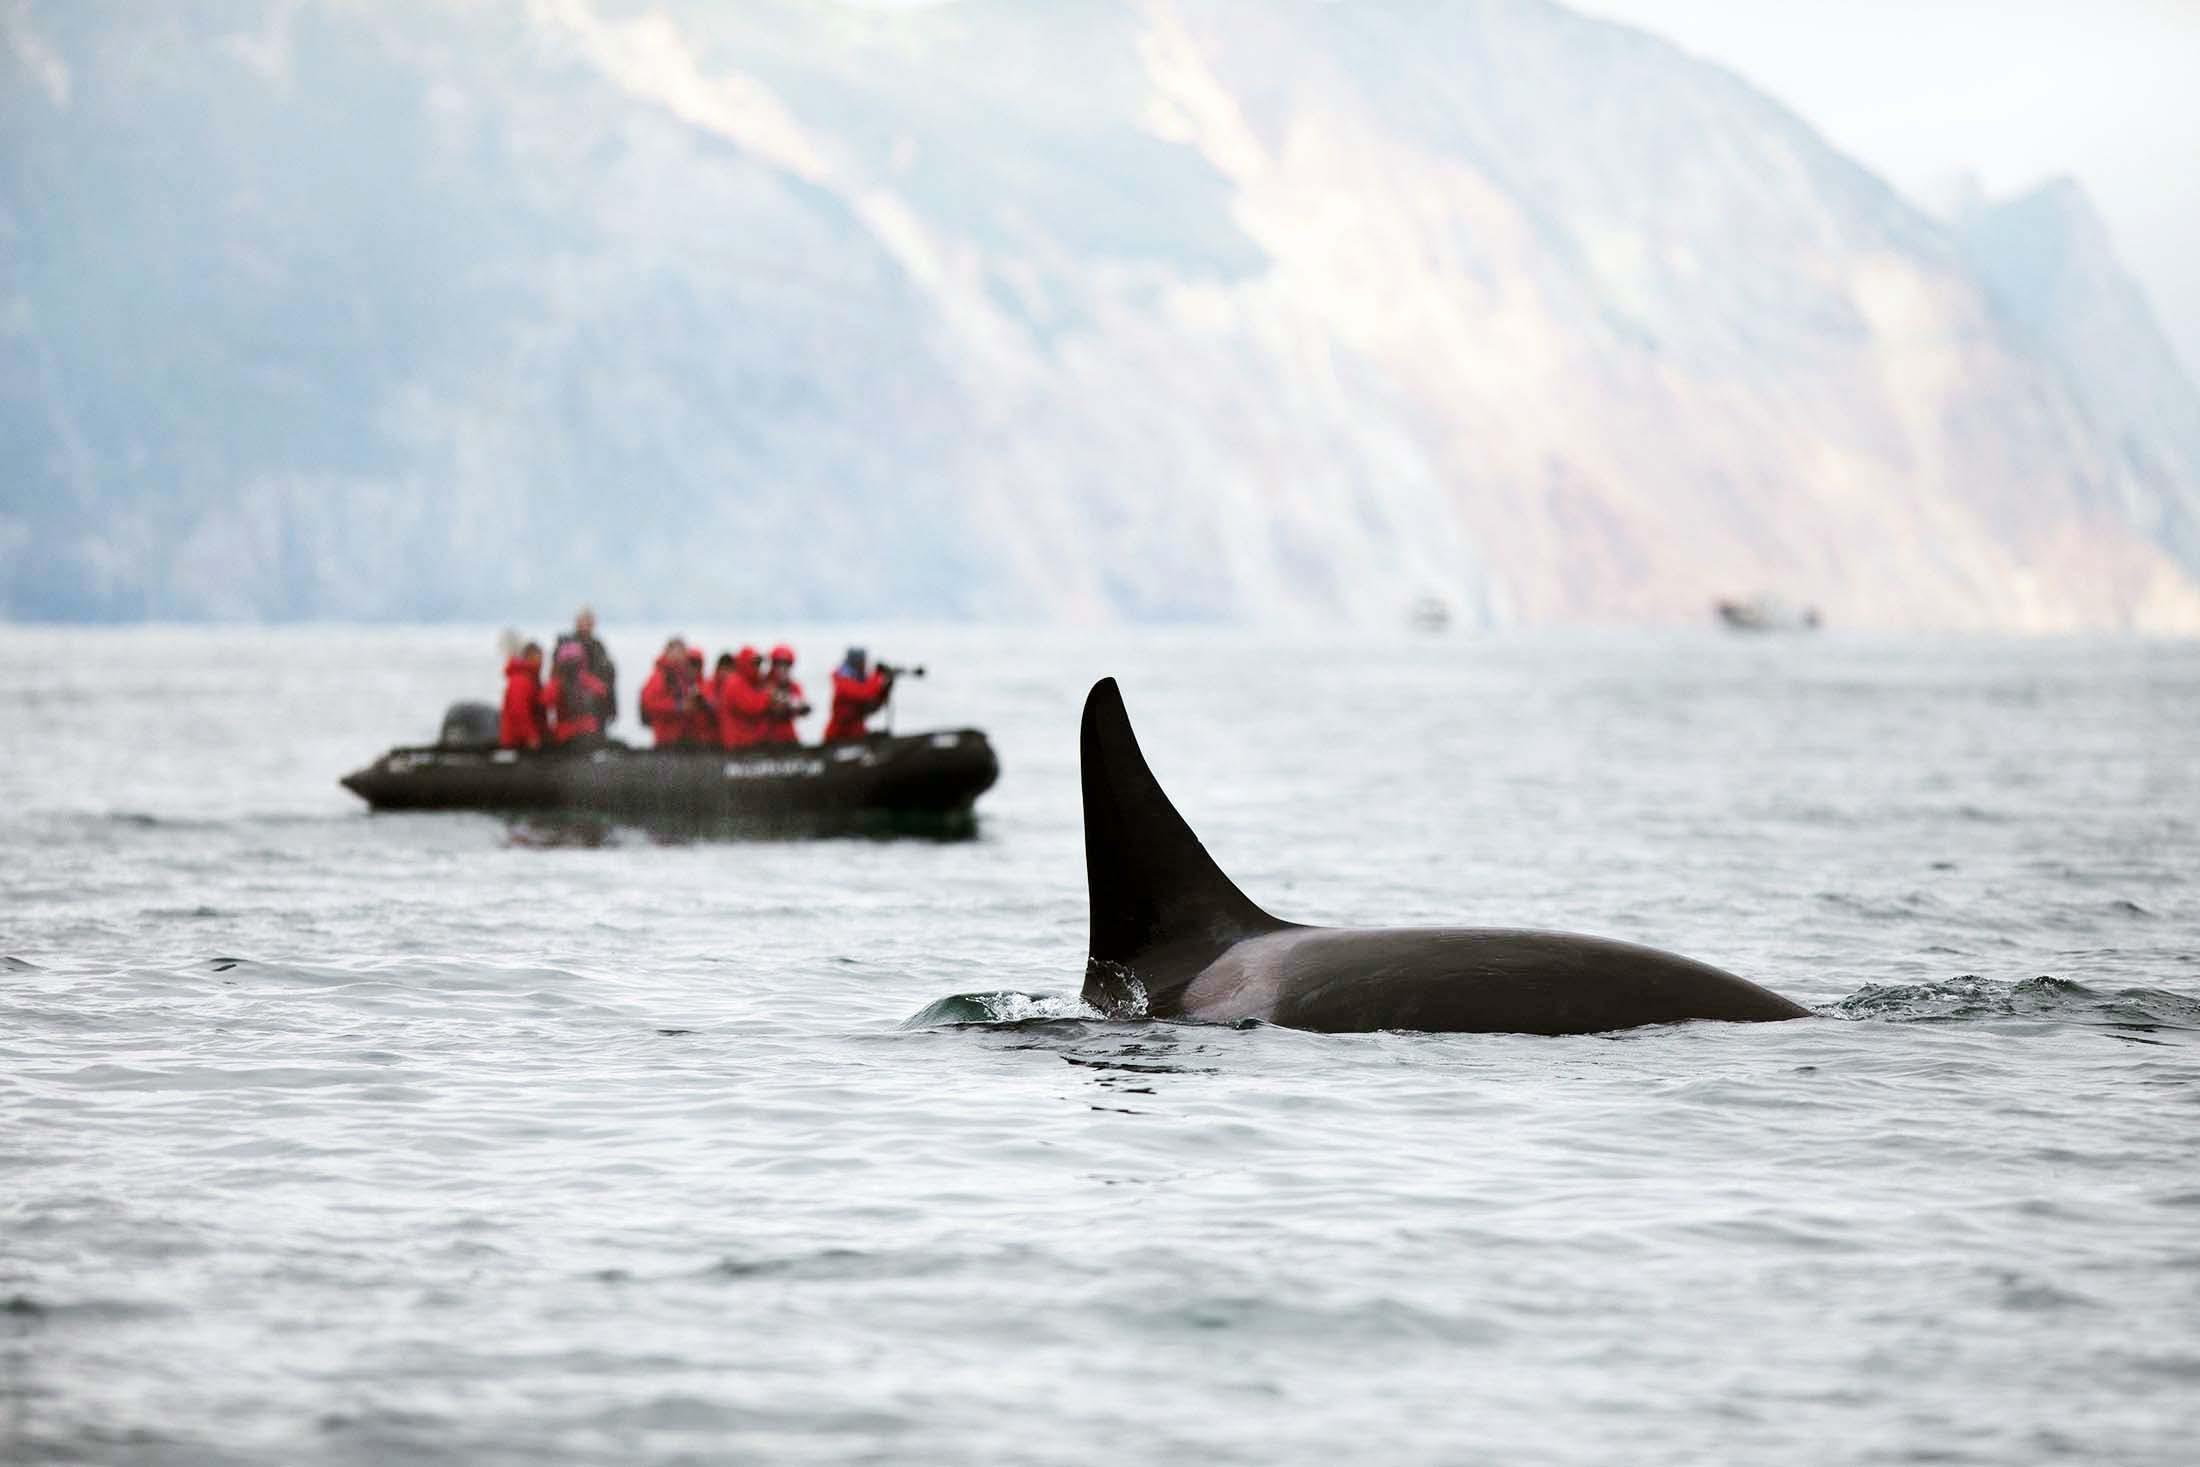 Killer whale, Kekurnyy Bay, Kamchatka, Russian Far East